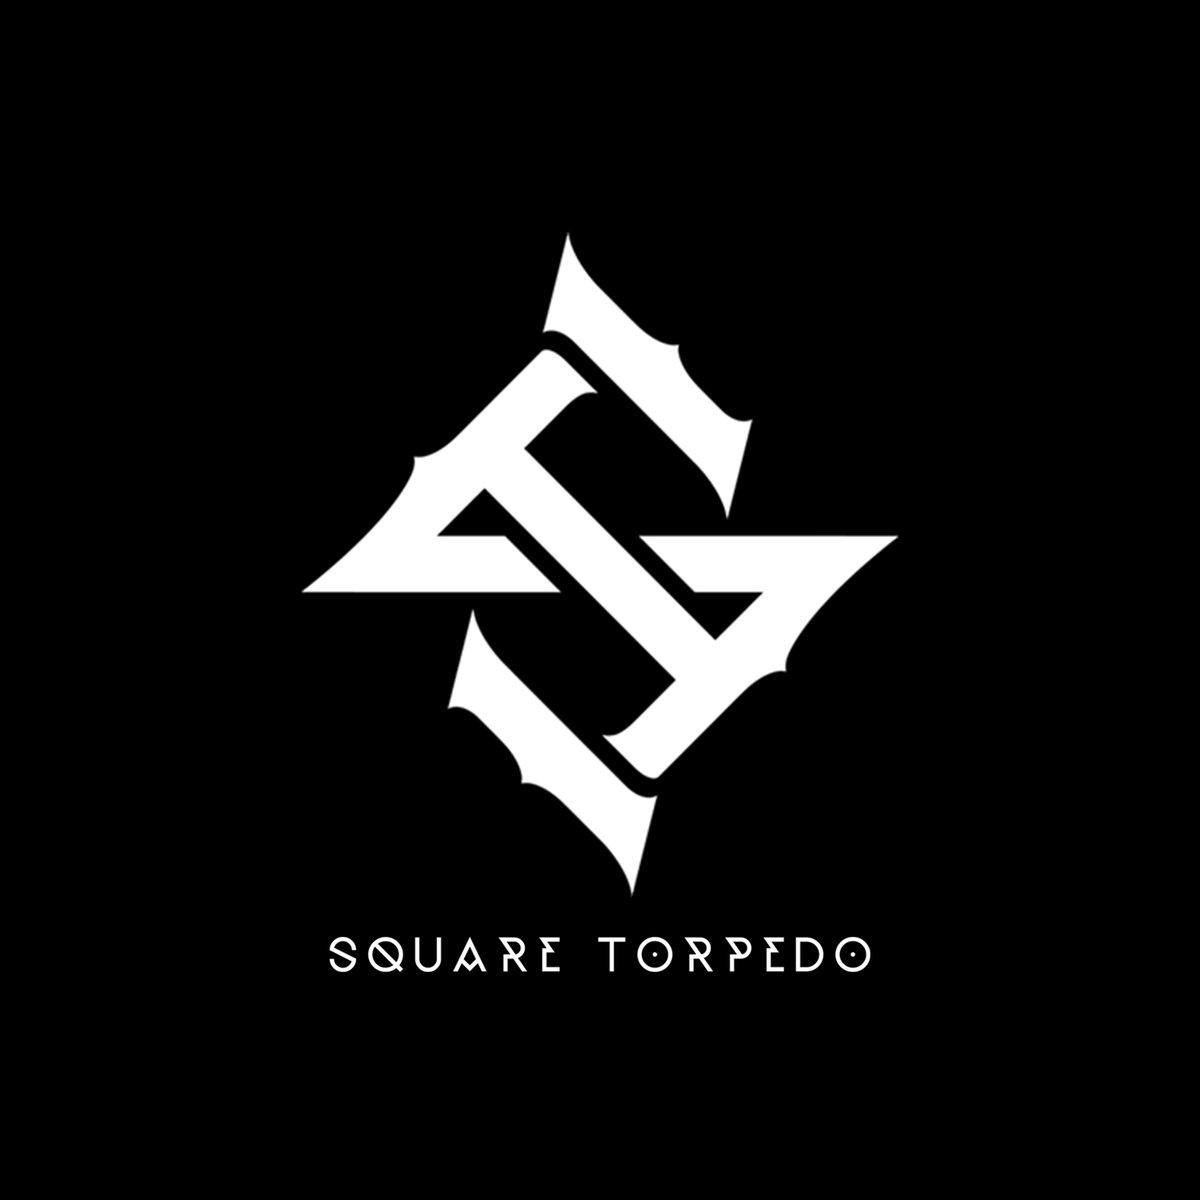 SQUARE TORPEDO picture